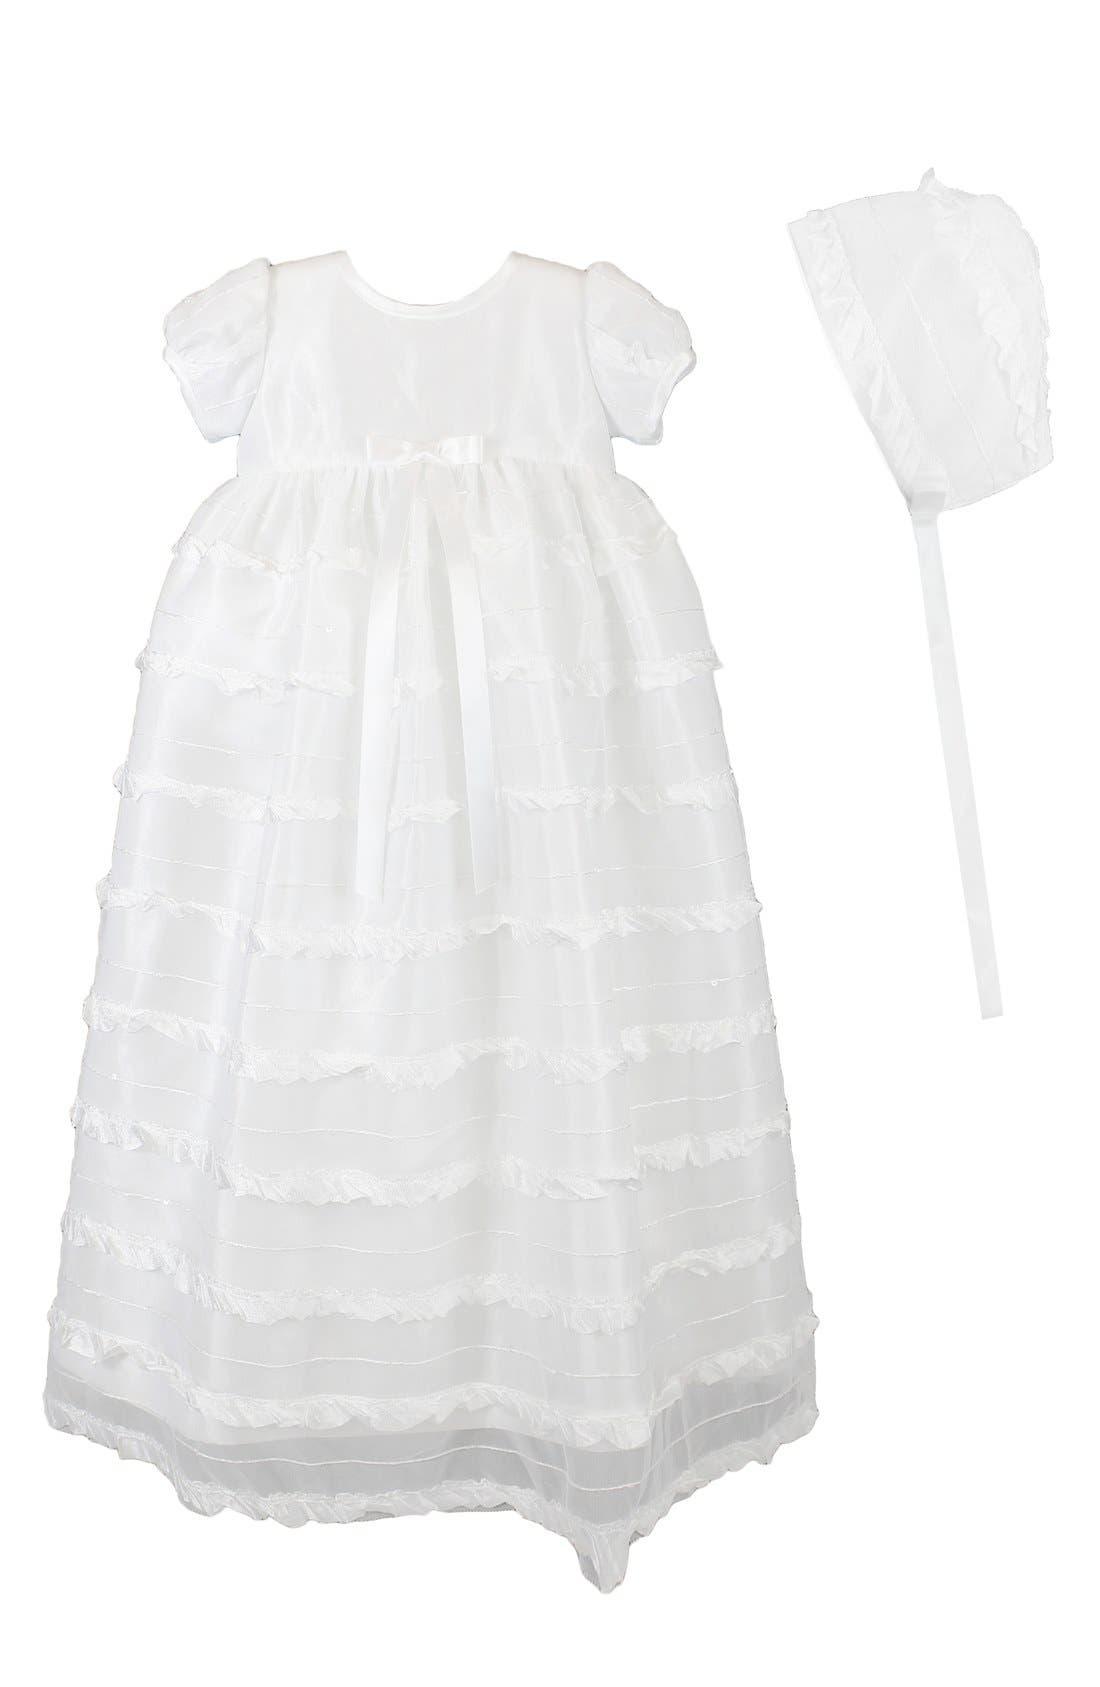 Main Image - C.I. Castro & Co 'Eyelash' Christening Gown & Bonnet (Baby Girls)